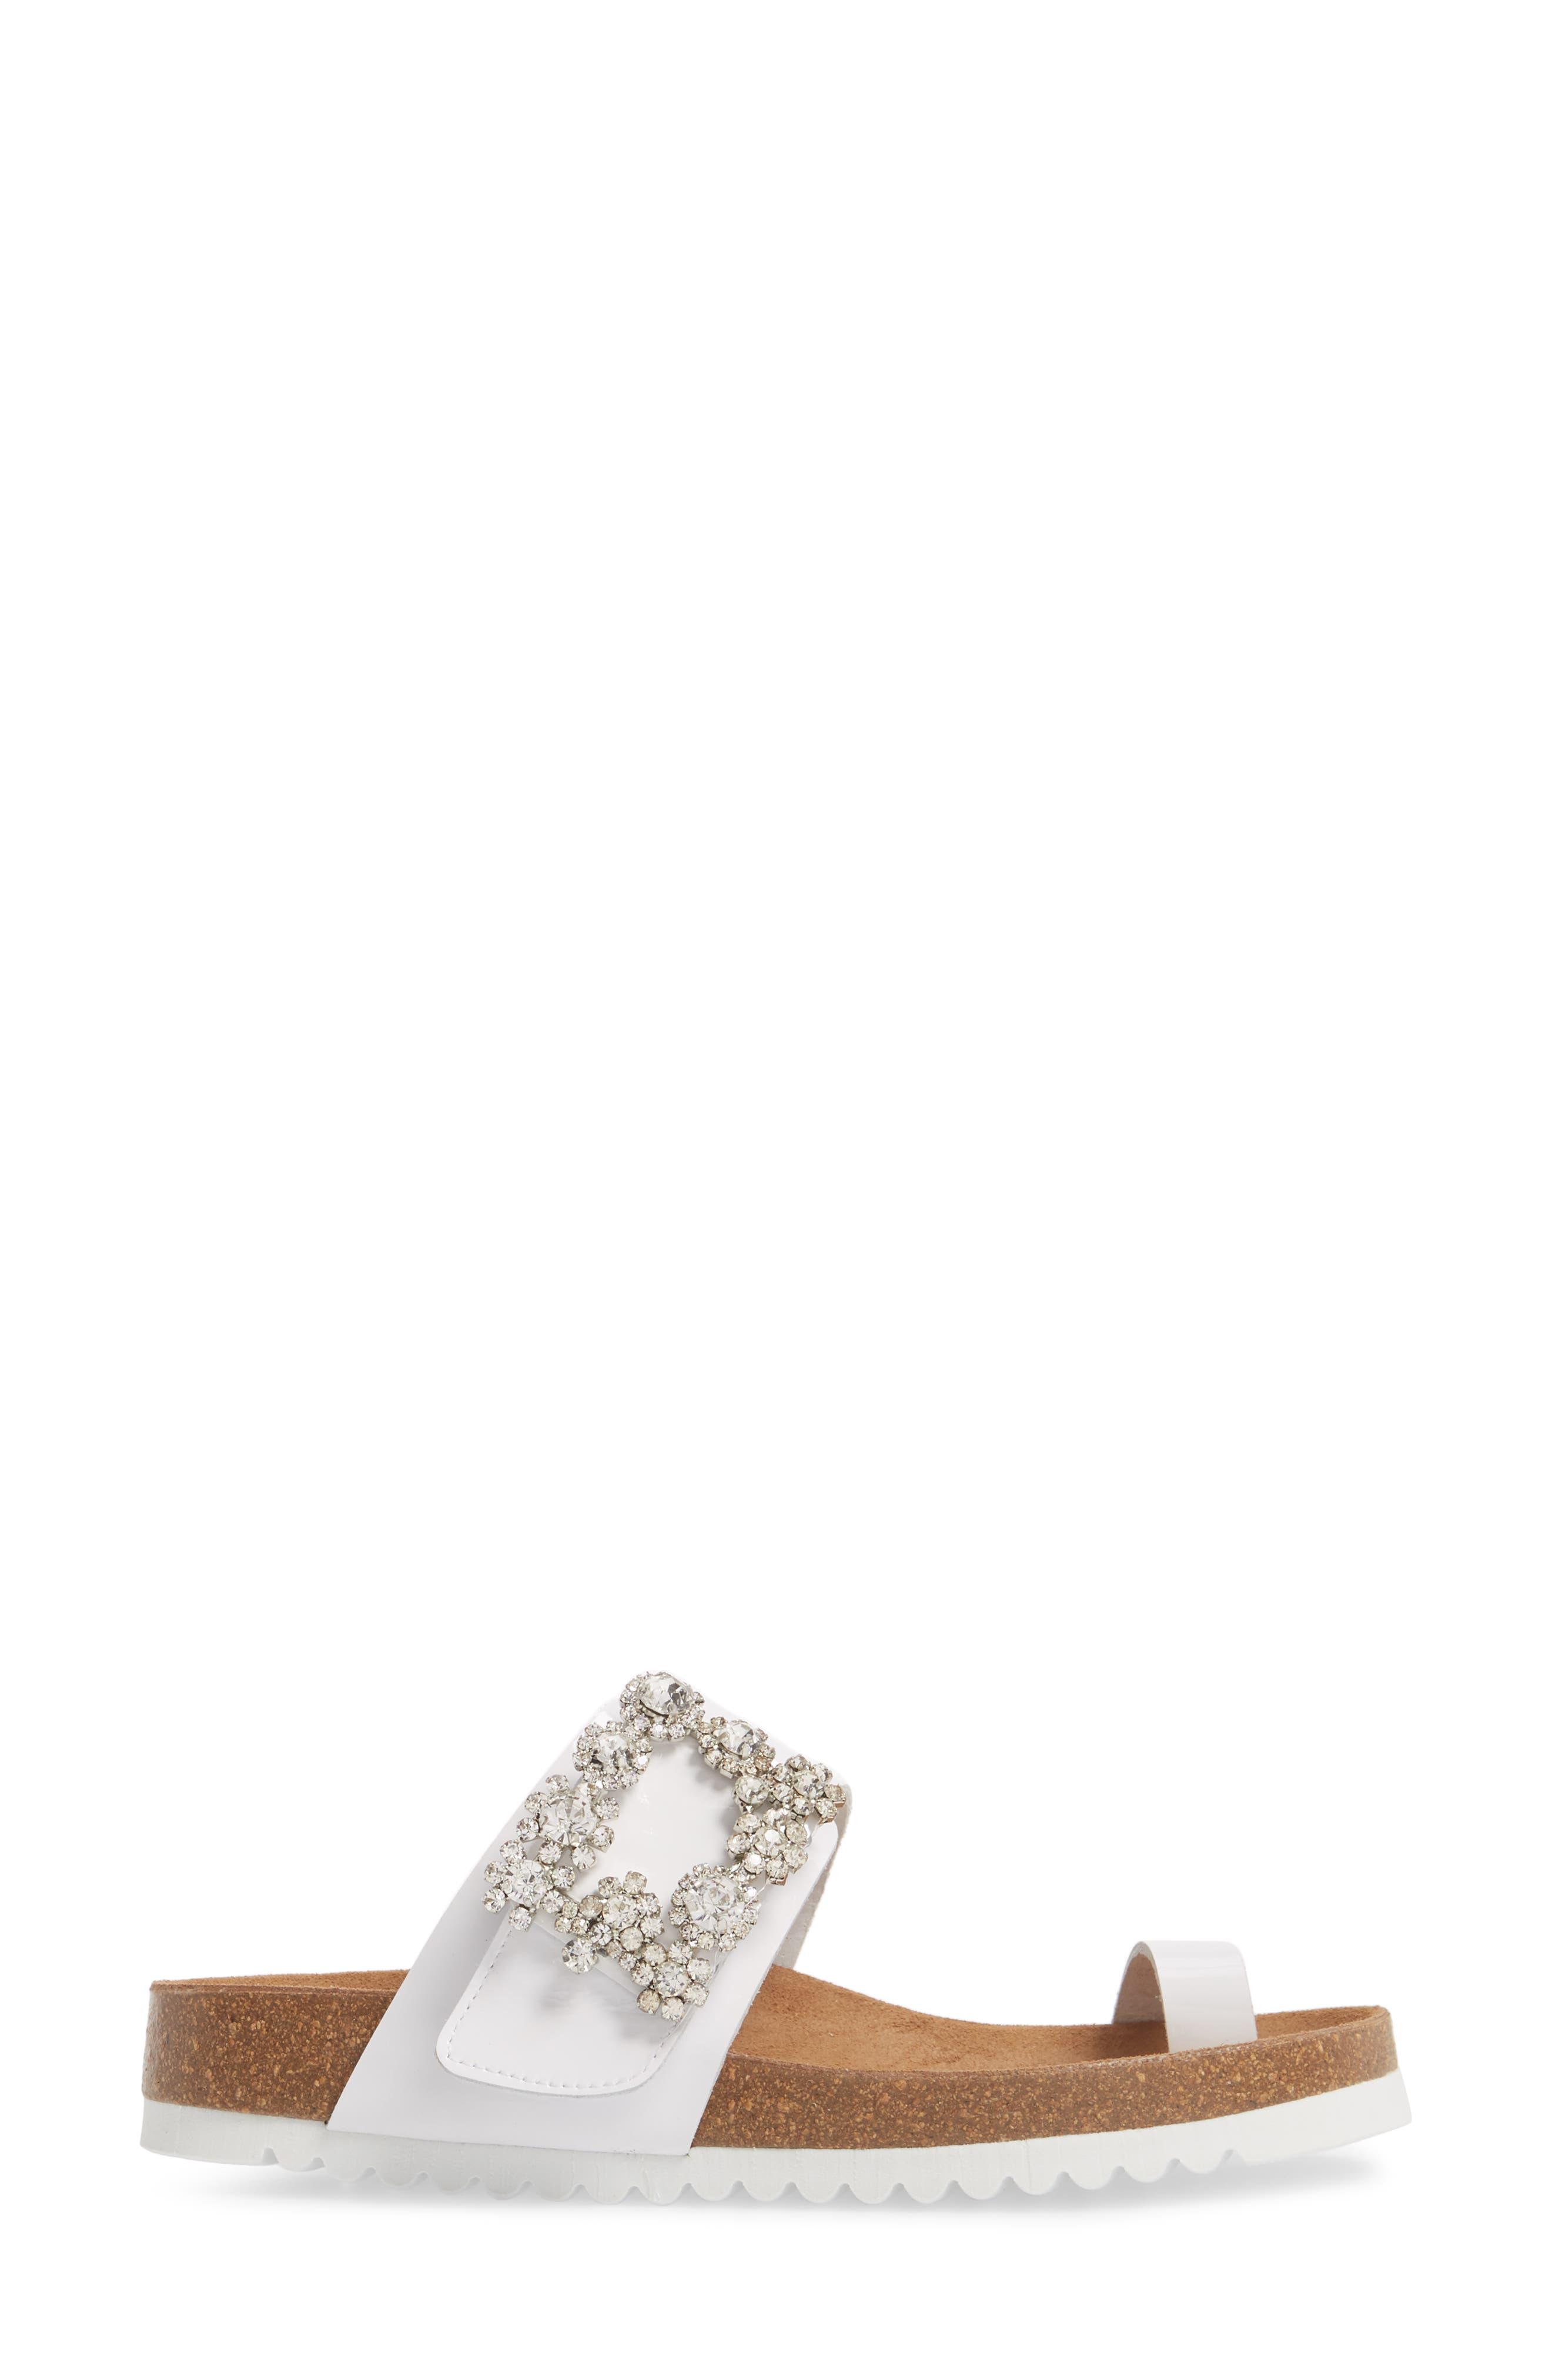 Bianca Embellished Slide Sandal,                             Alternate thumbnail 3, color,                             White Patent/ Silver